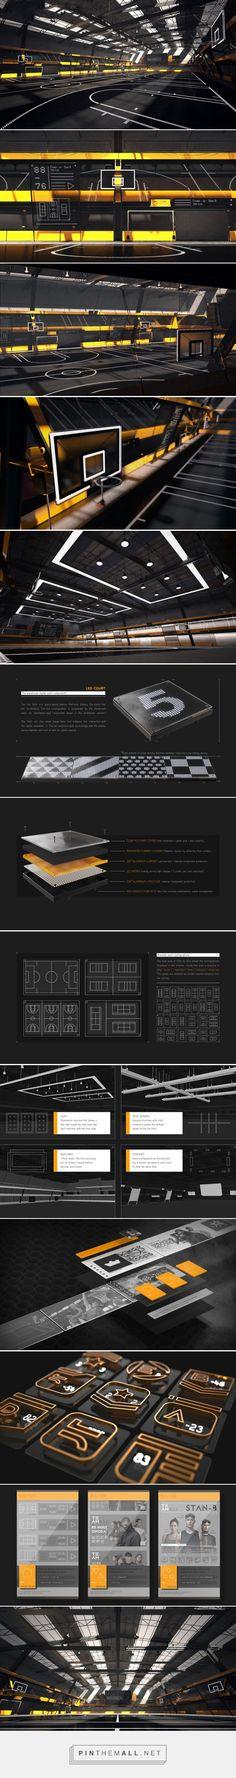 Lights on! Game on! | Yanko Design - created via http://pinthemall.net